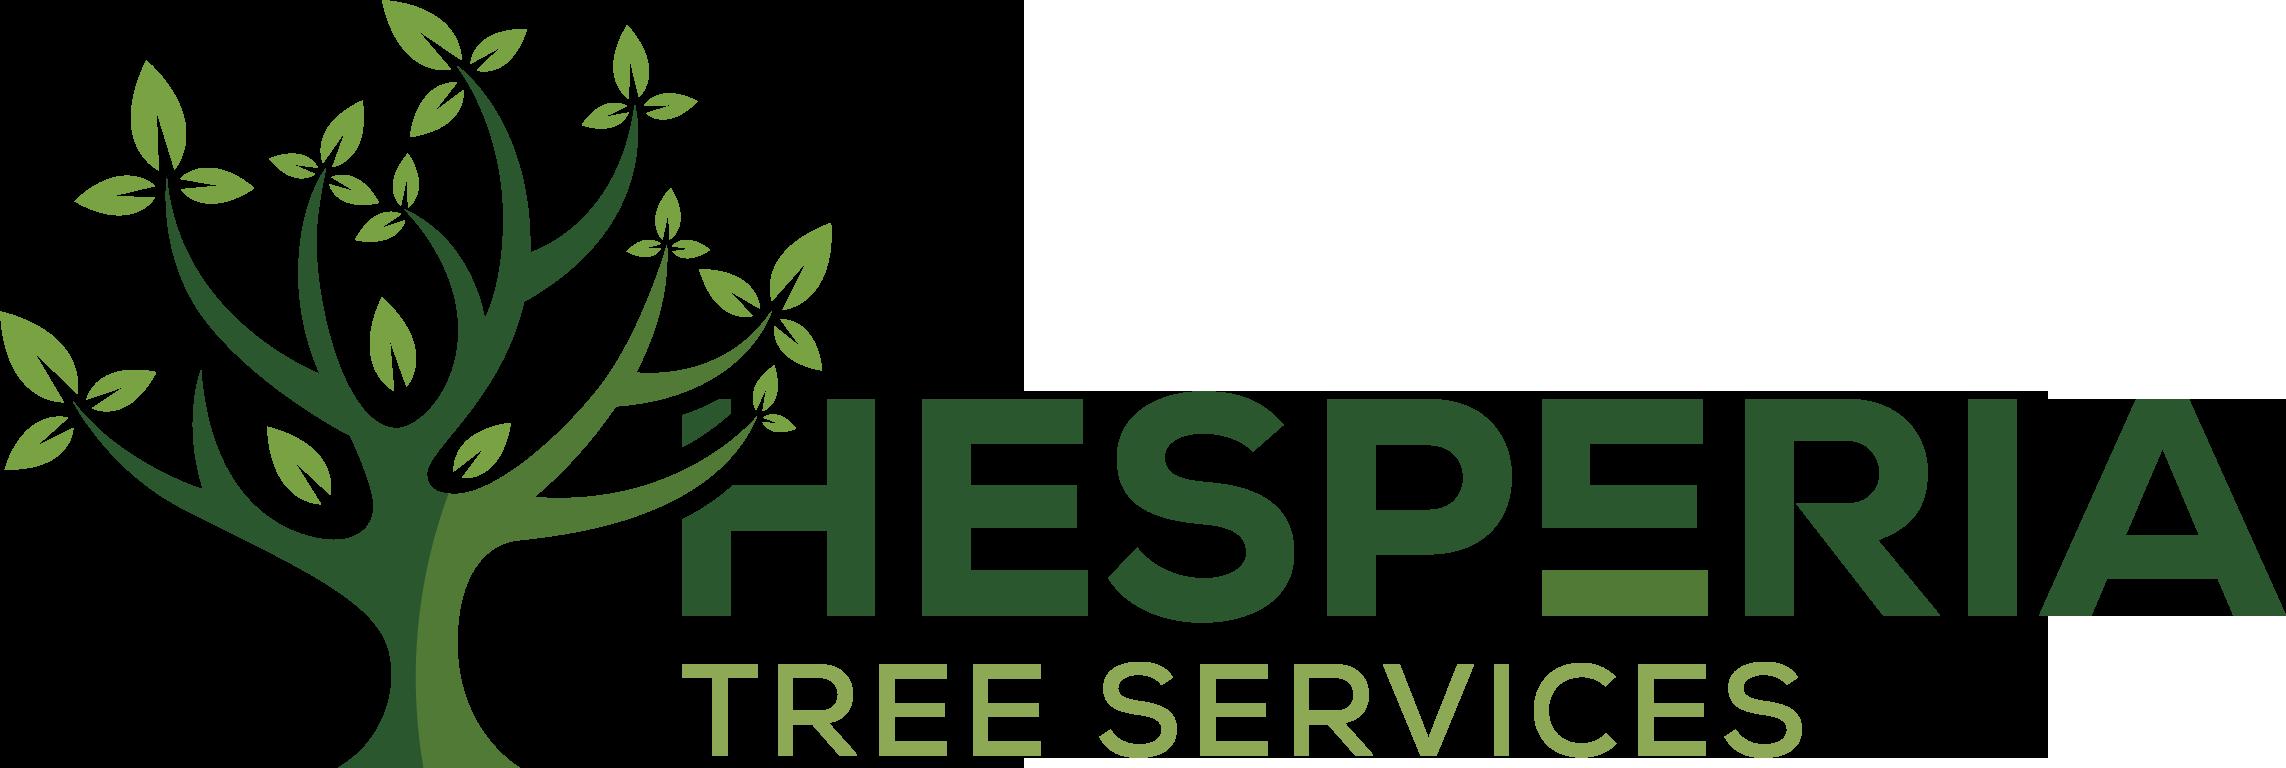 Hesperia Tree Services